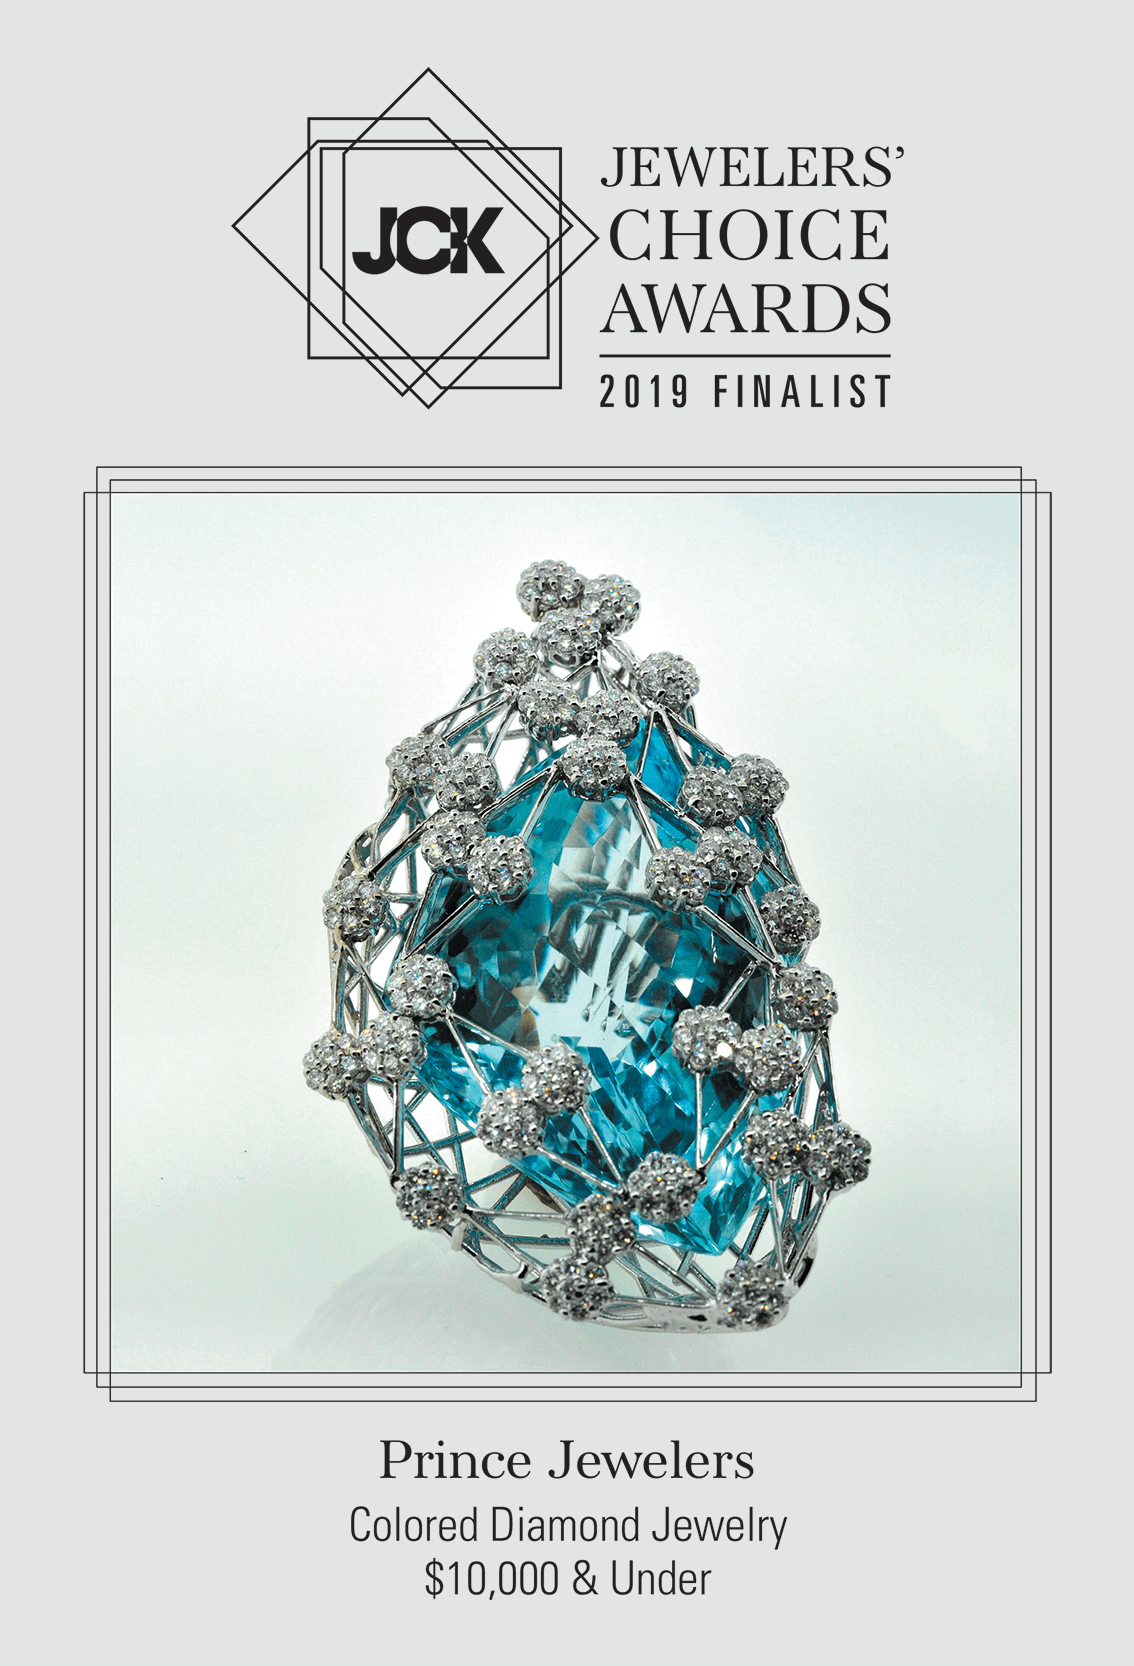 Jewelry Choice AWards 2019 Finalist for Colored Diamond Jewelry